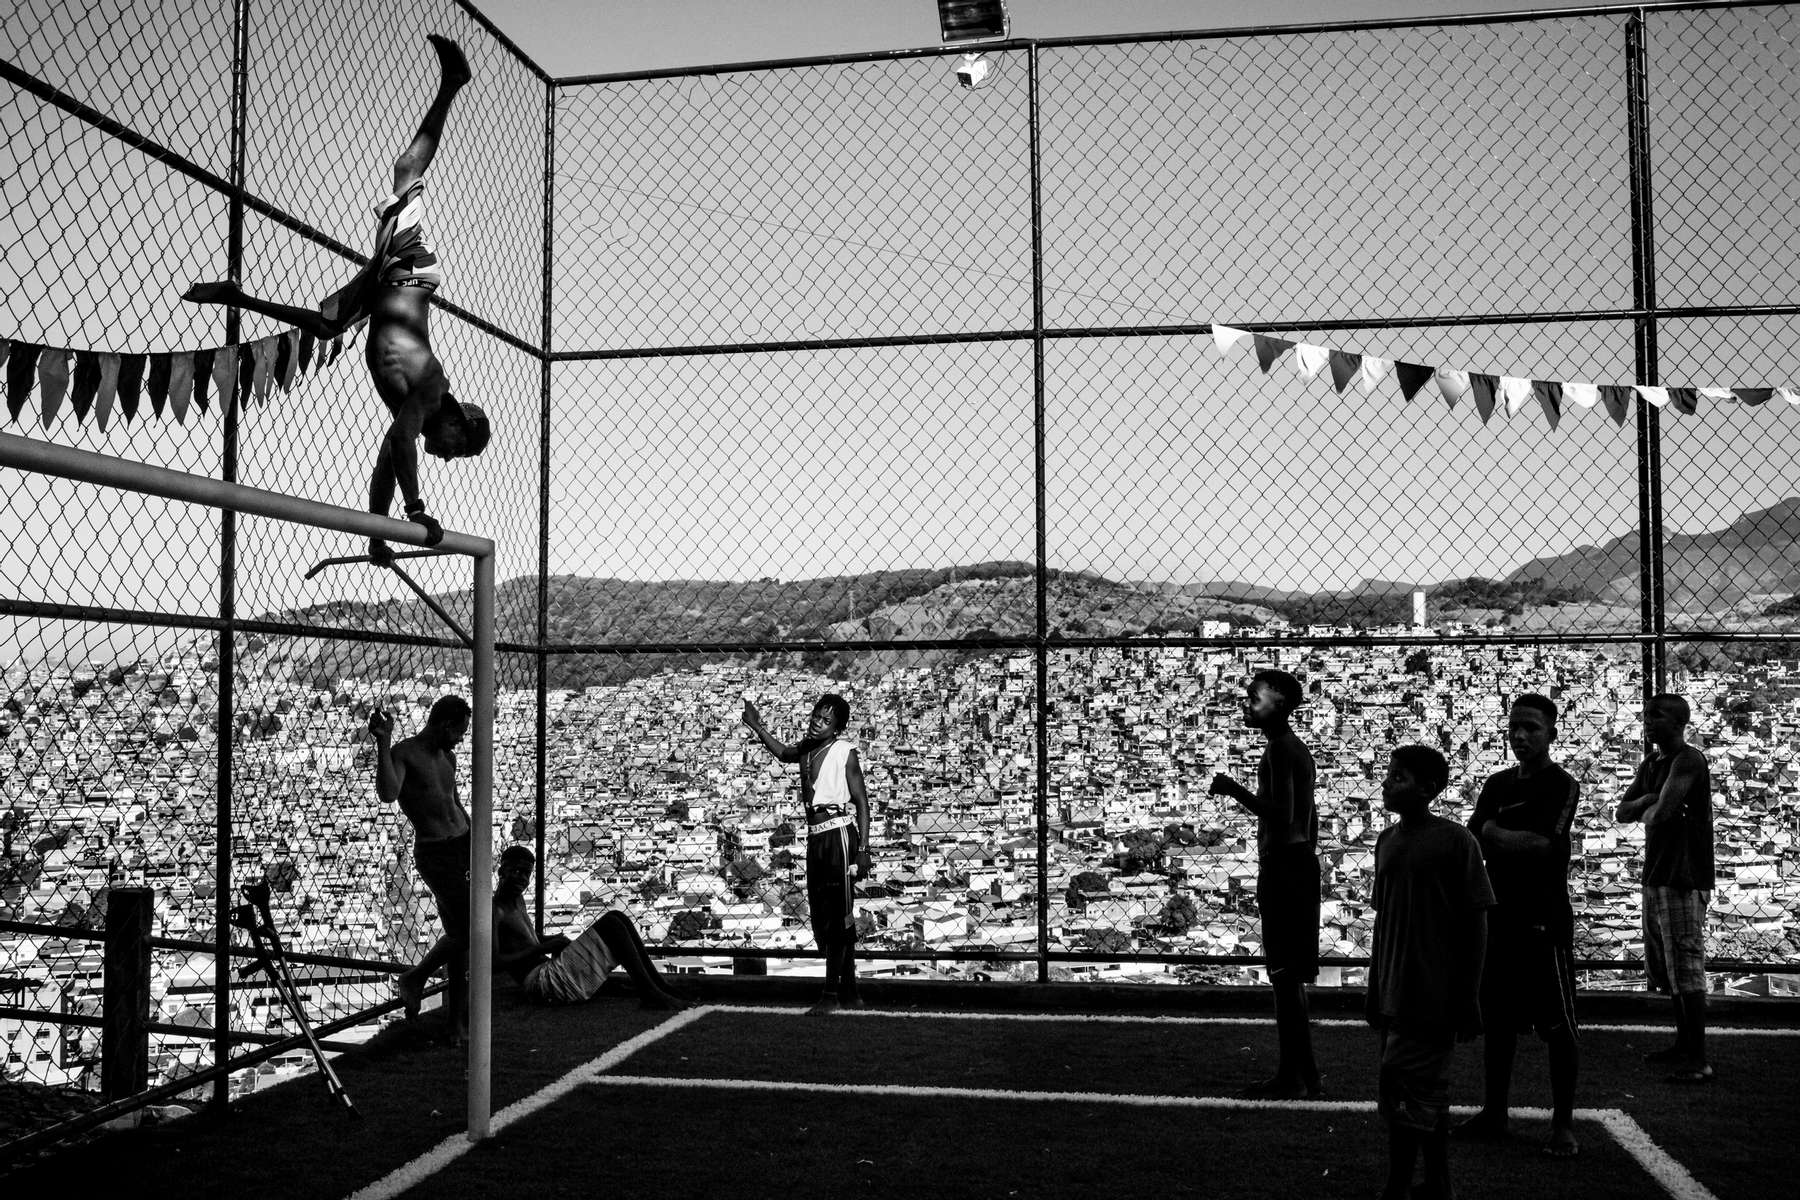 Un grupo de adolescentes divirtiéndose en un campo de fútbol en el Complexo da Penha, en Río de Janeiro, Brasil, 07 de junio de 2015.